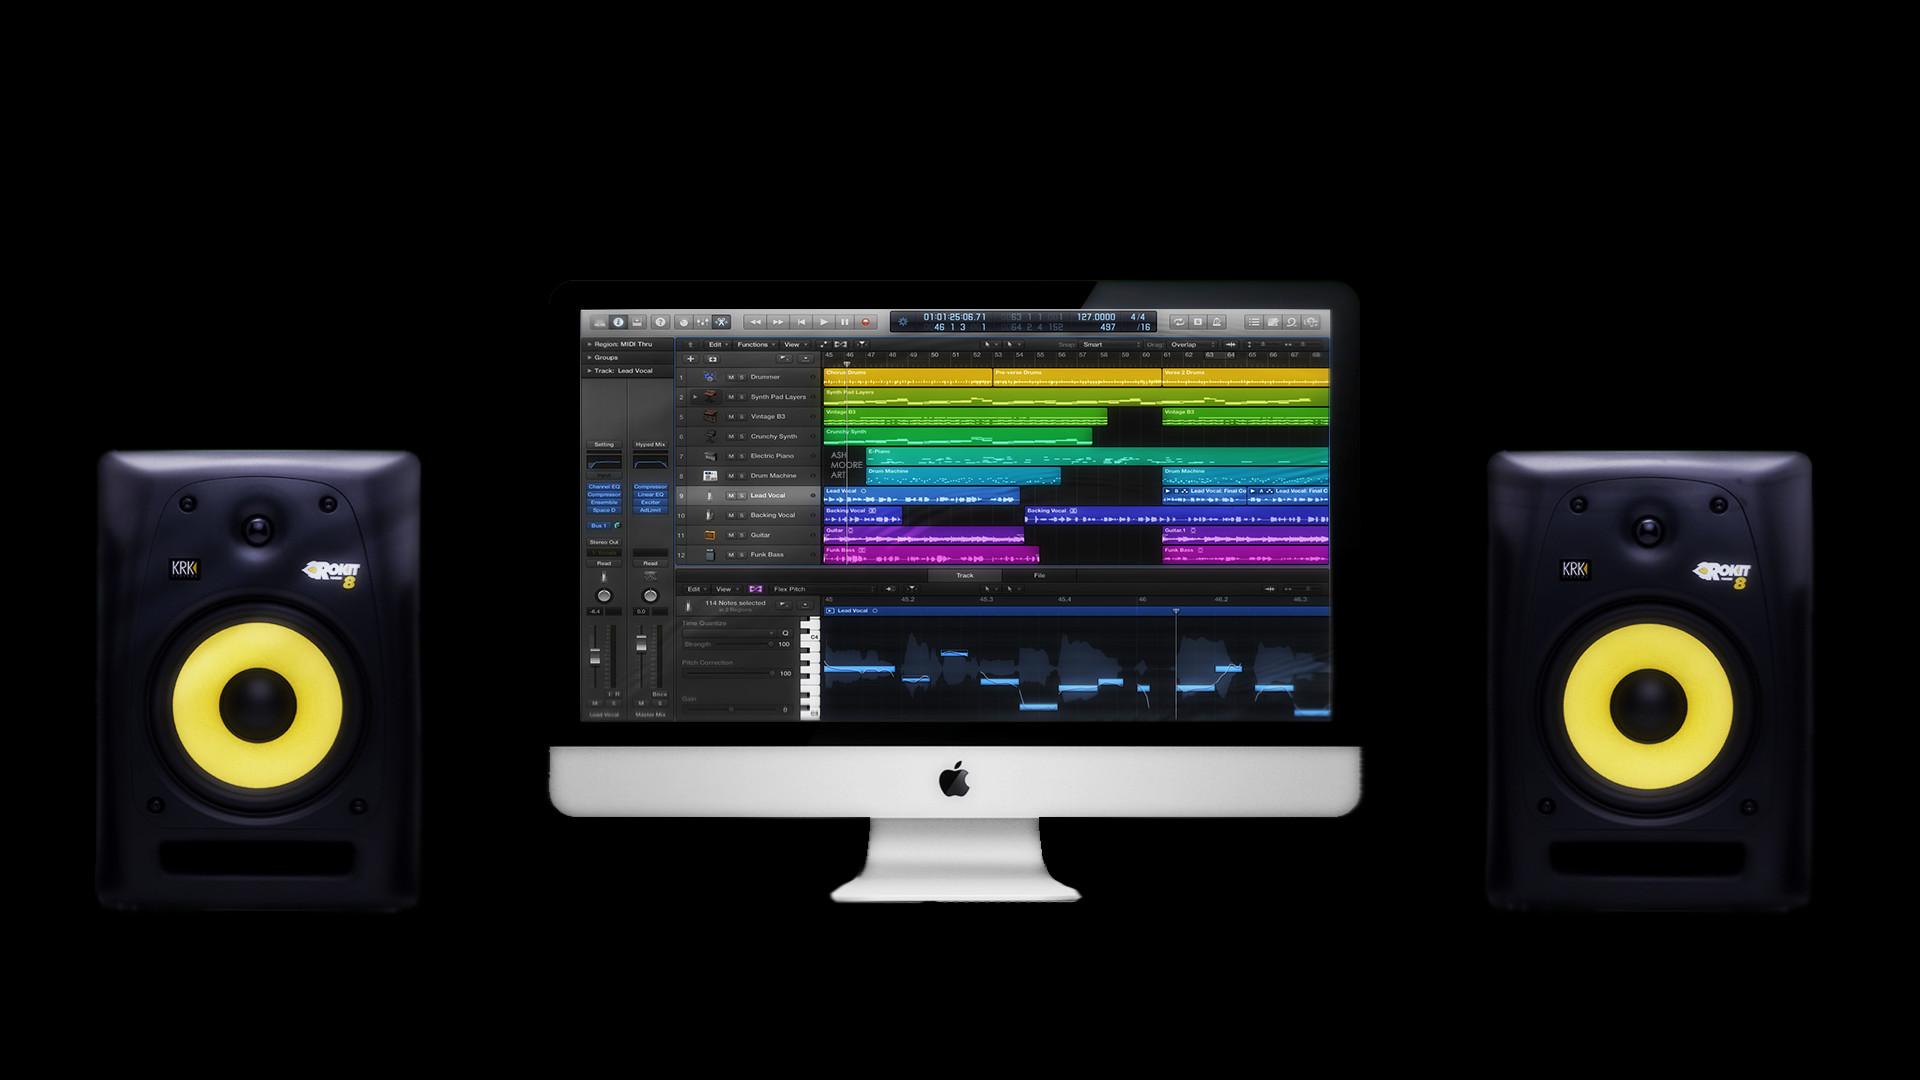 Recording Studio Iphone Wallpaper Logic Wallpaper Hd 78 Images